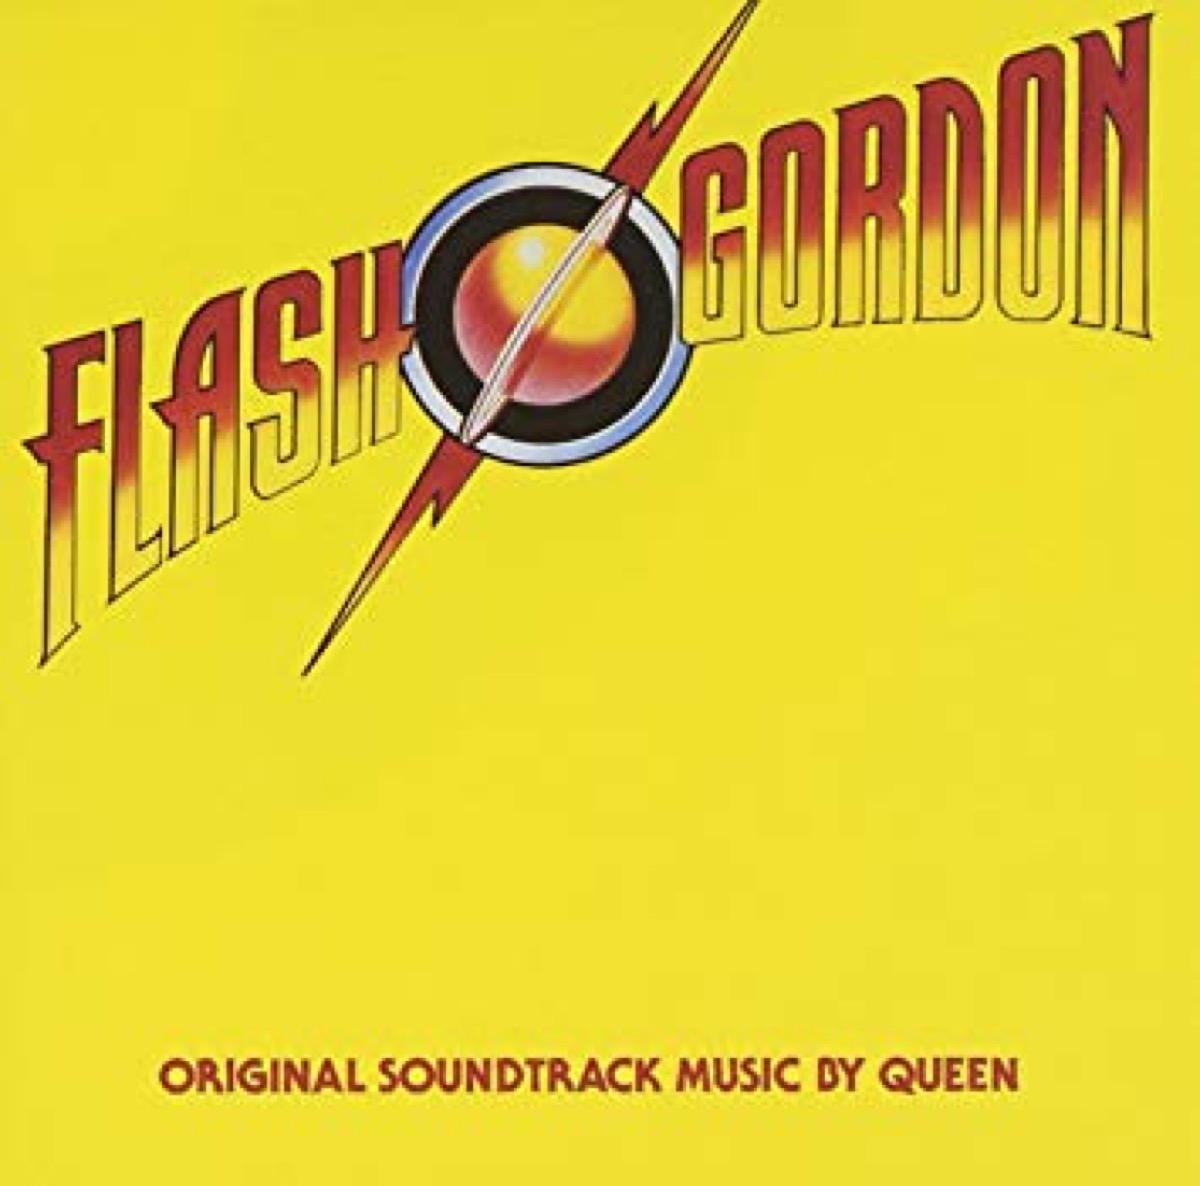 flash gordon movie soundtrack album cover